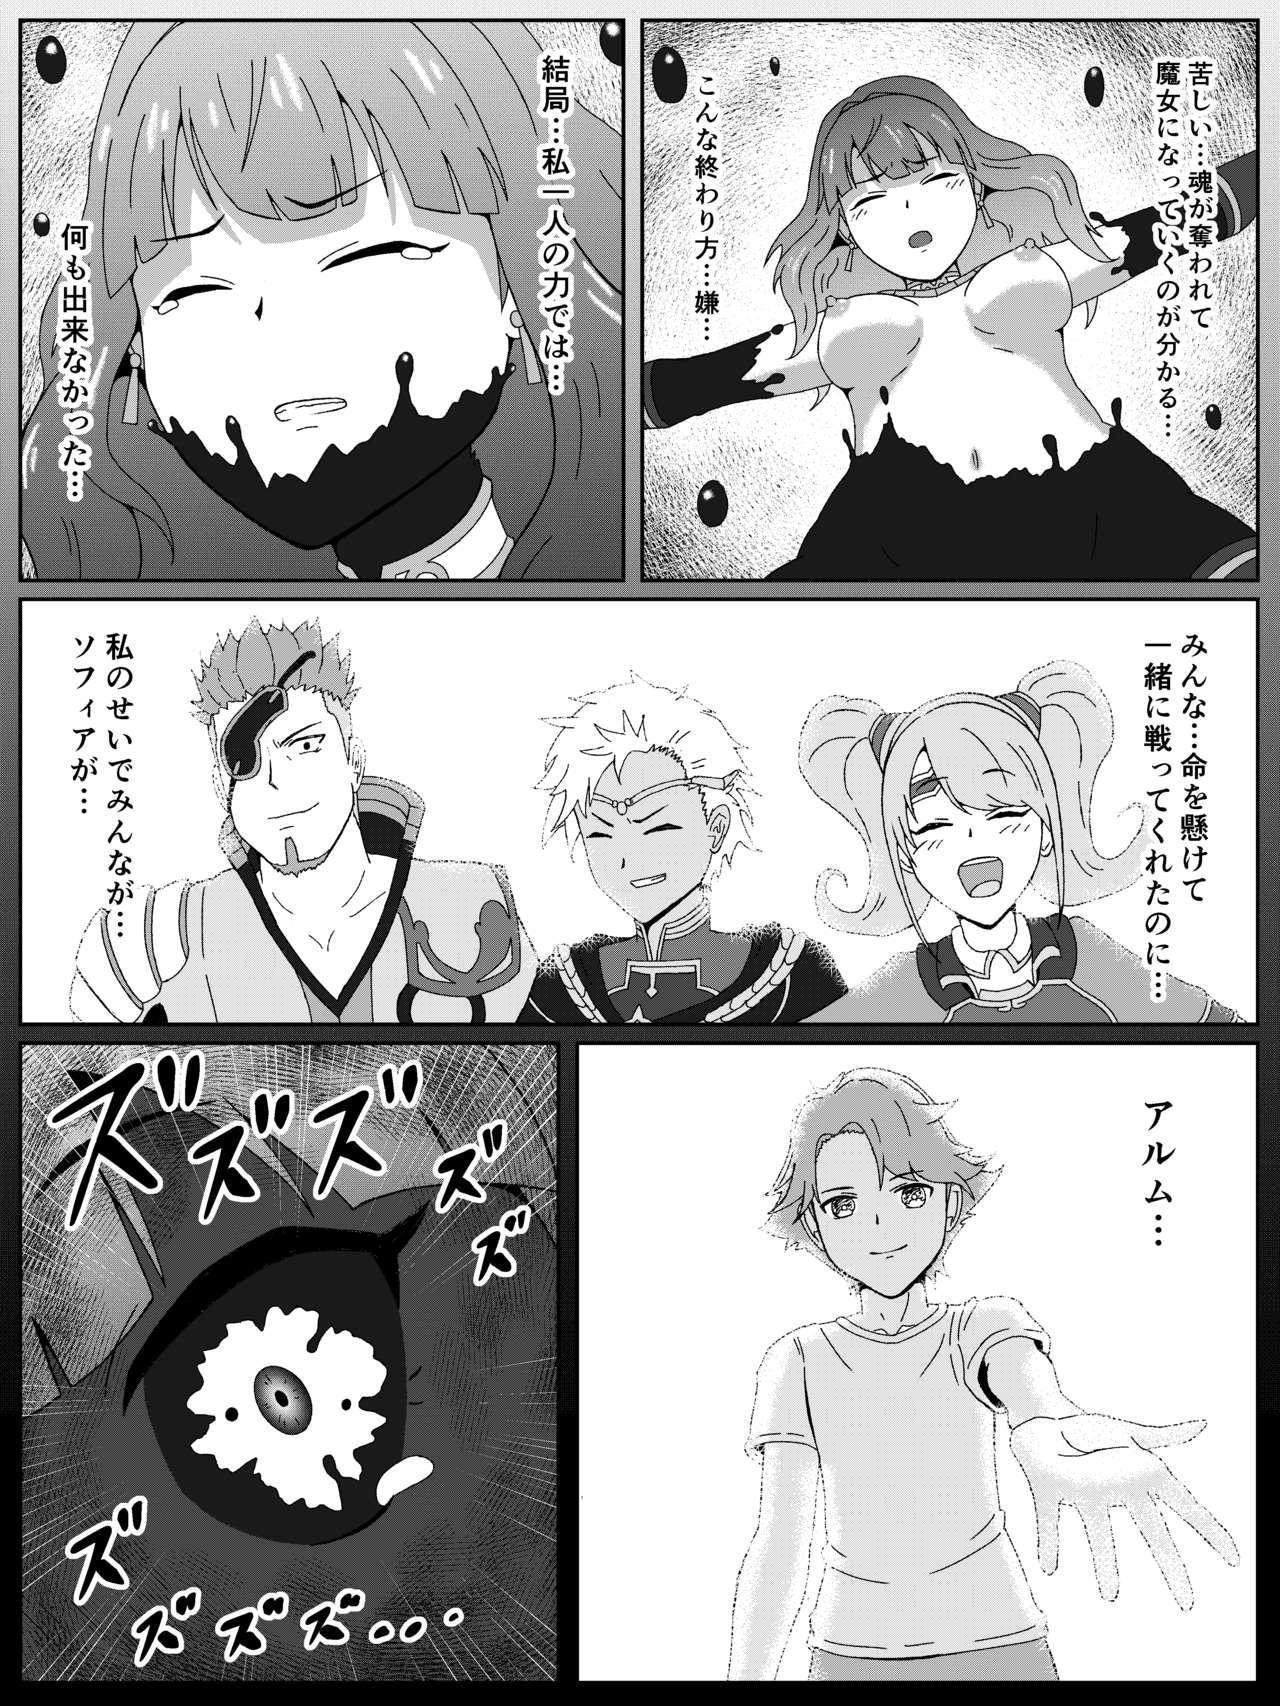 Fire Emblem Echoes no Celica Akuochi Manga 5